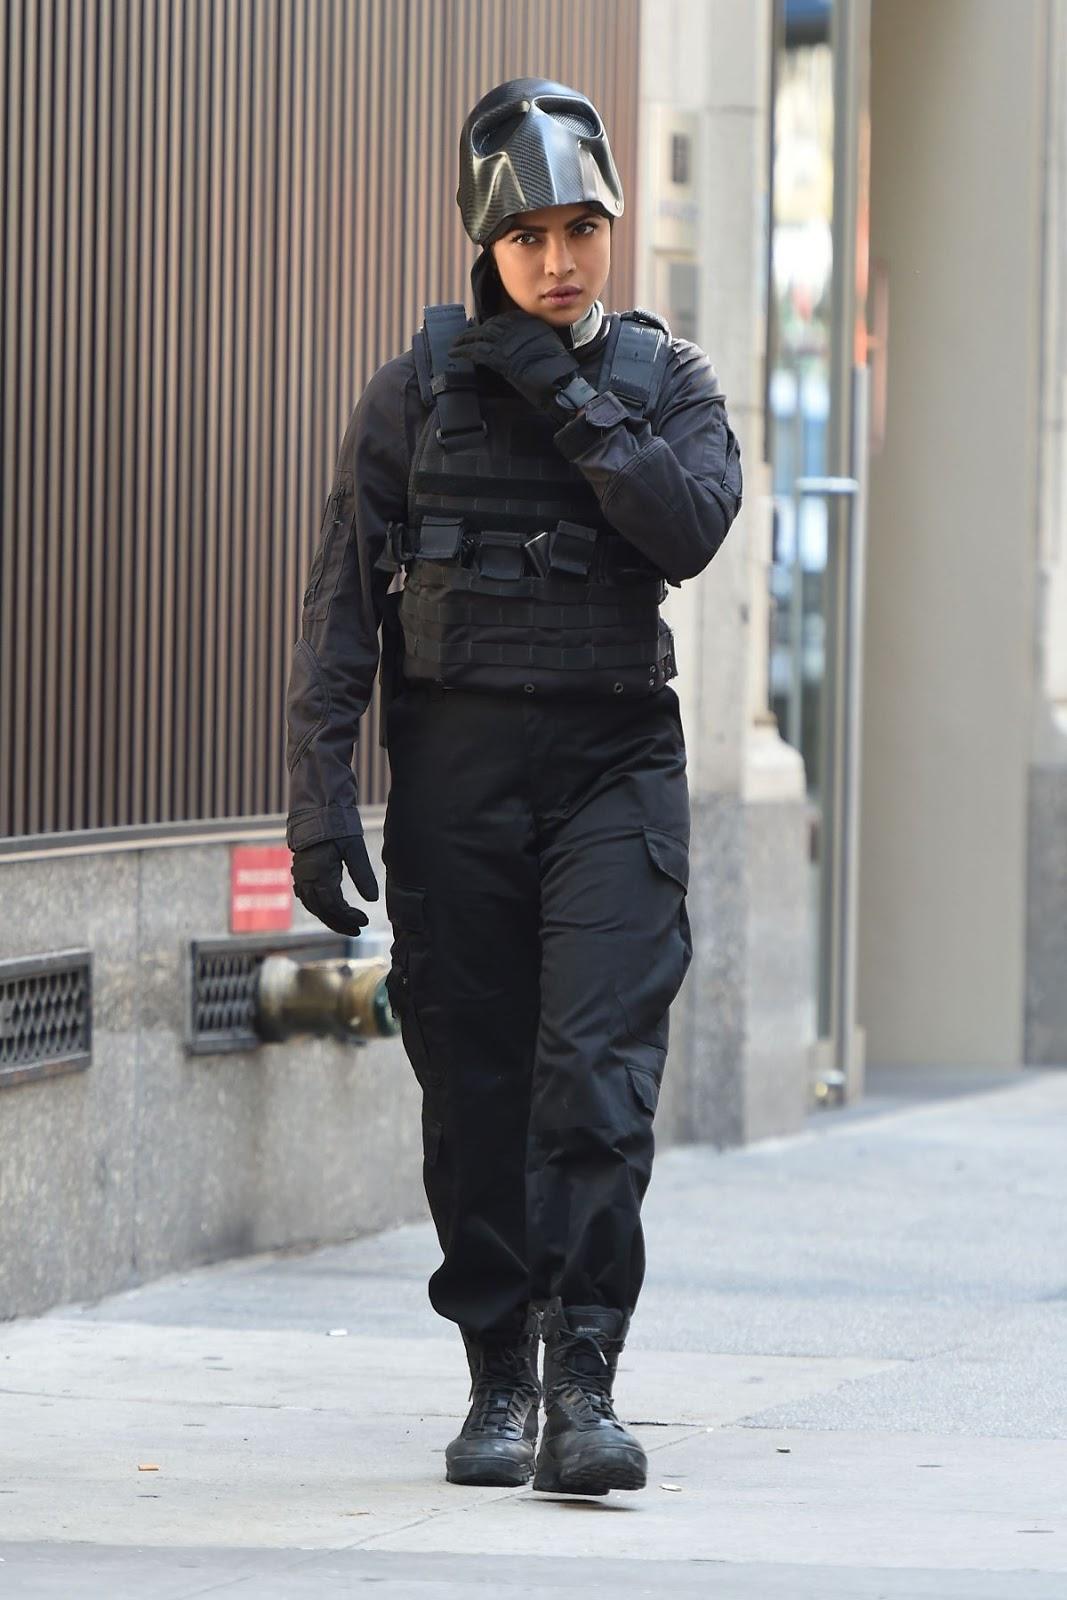 Priyanka Chopra on The Set of Drama Series Quantico in New York